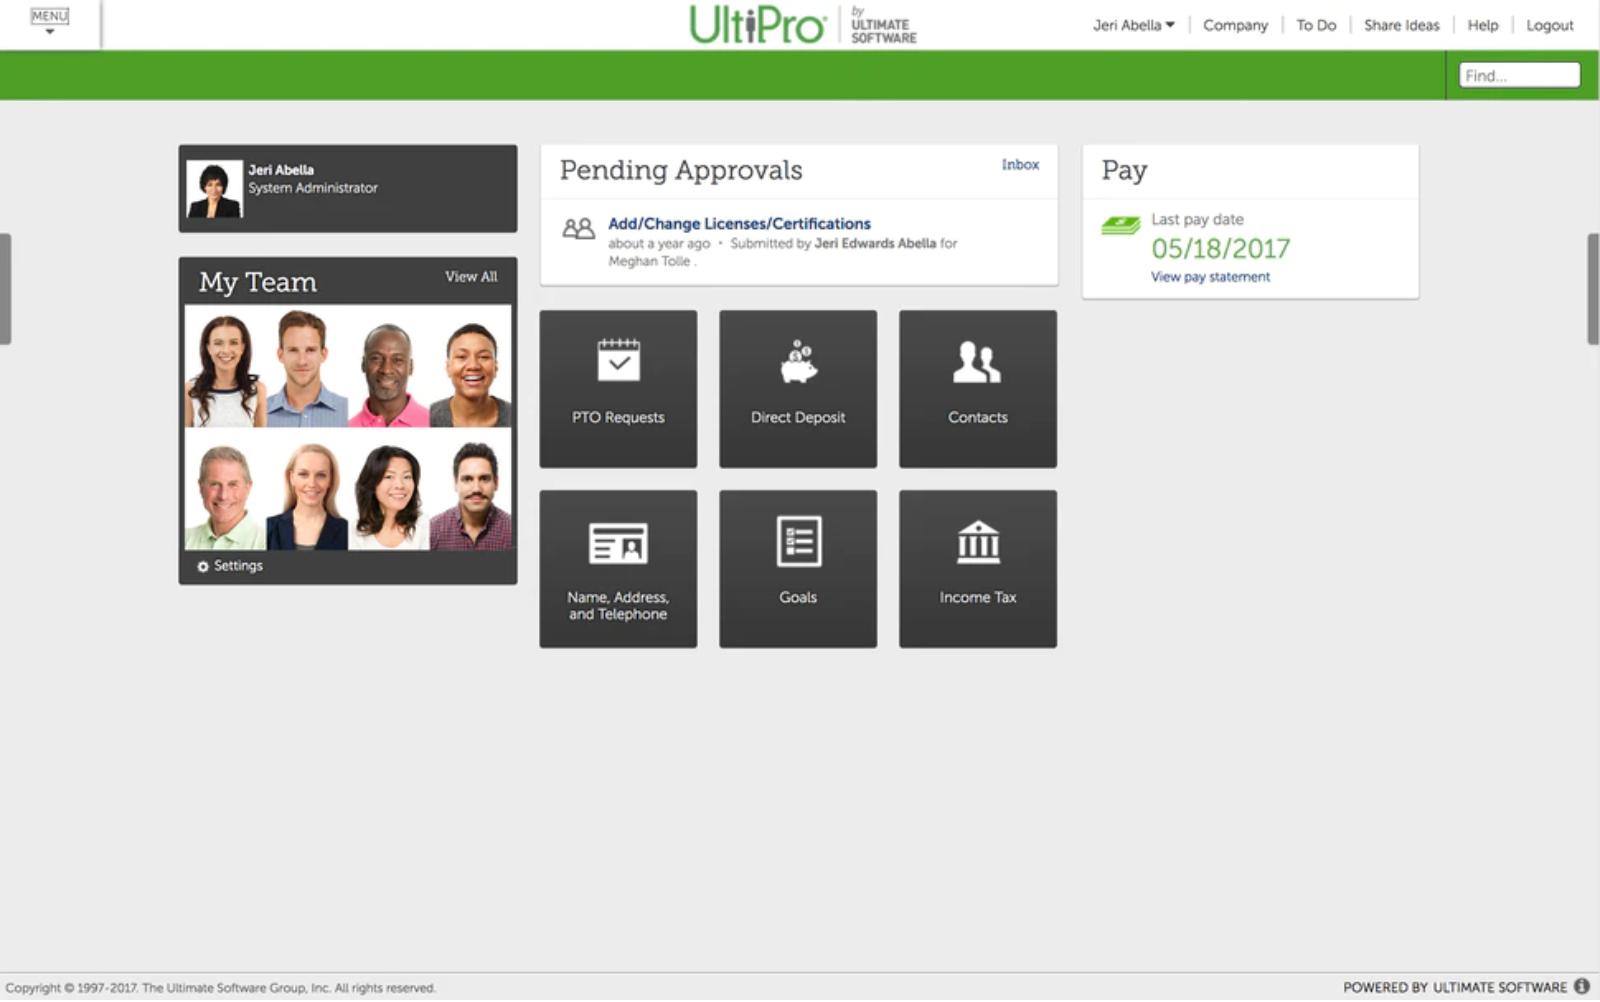 UltiPro - Dashboard